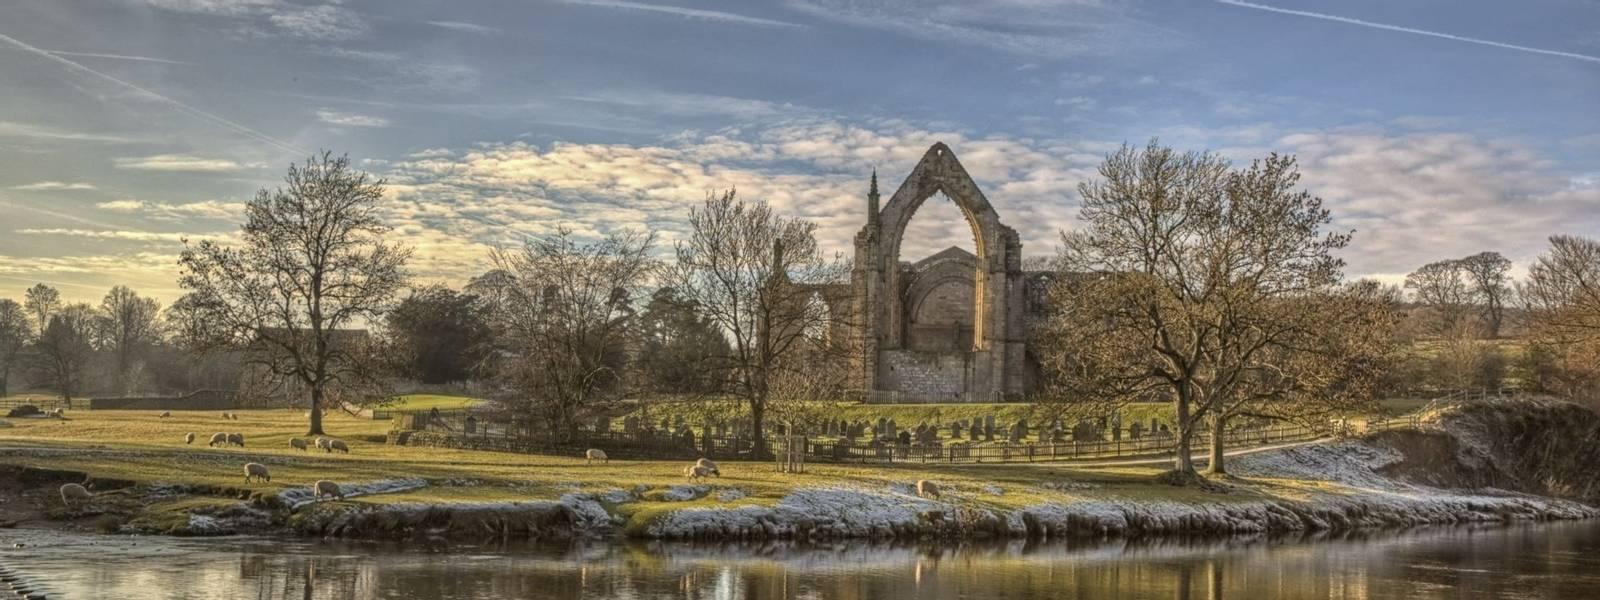 Bolton_Abbey_Yorkshire_Dales_AdobeStock_131233755.jpeg